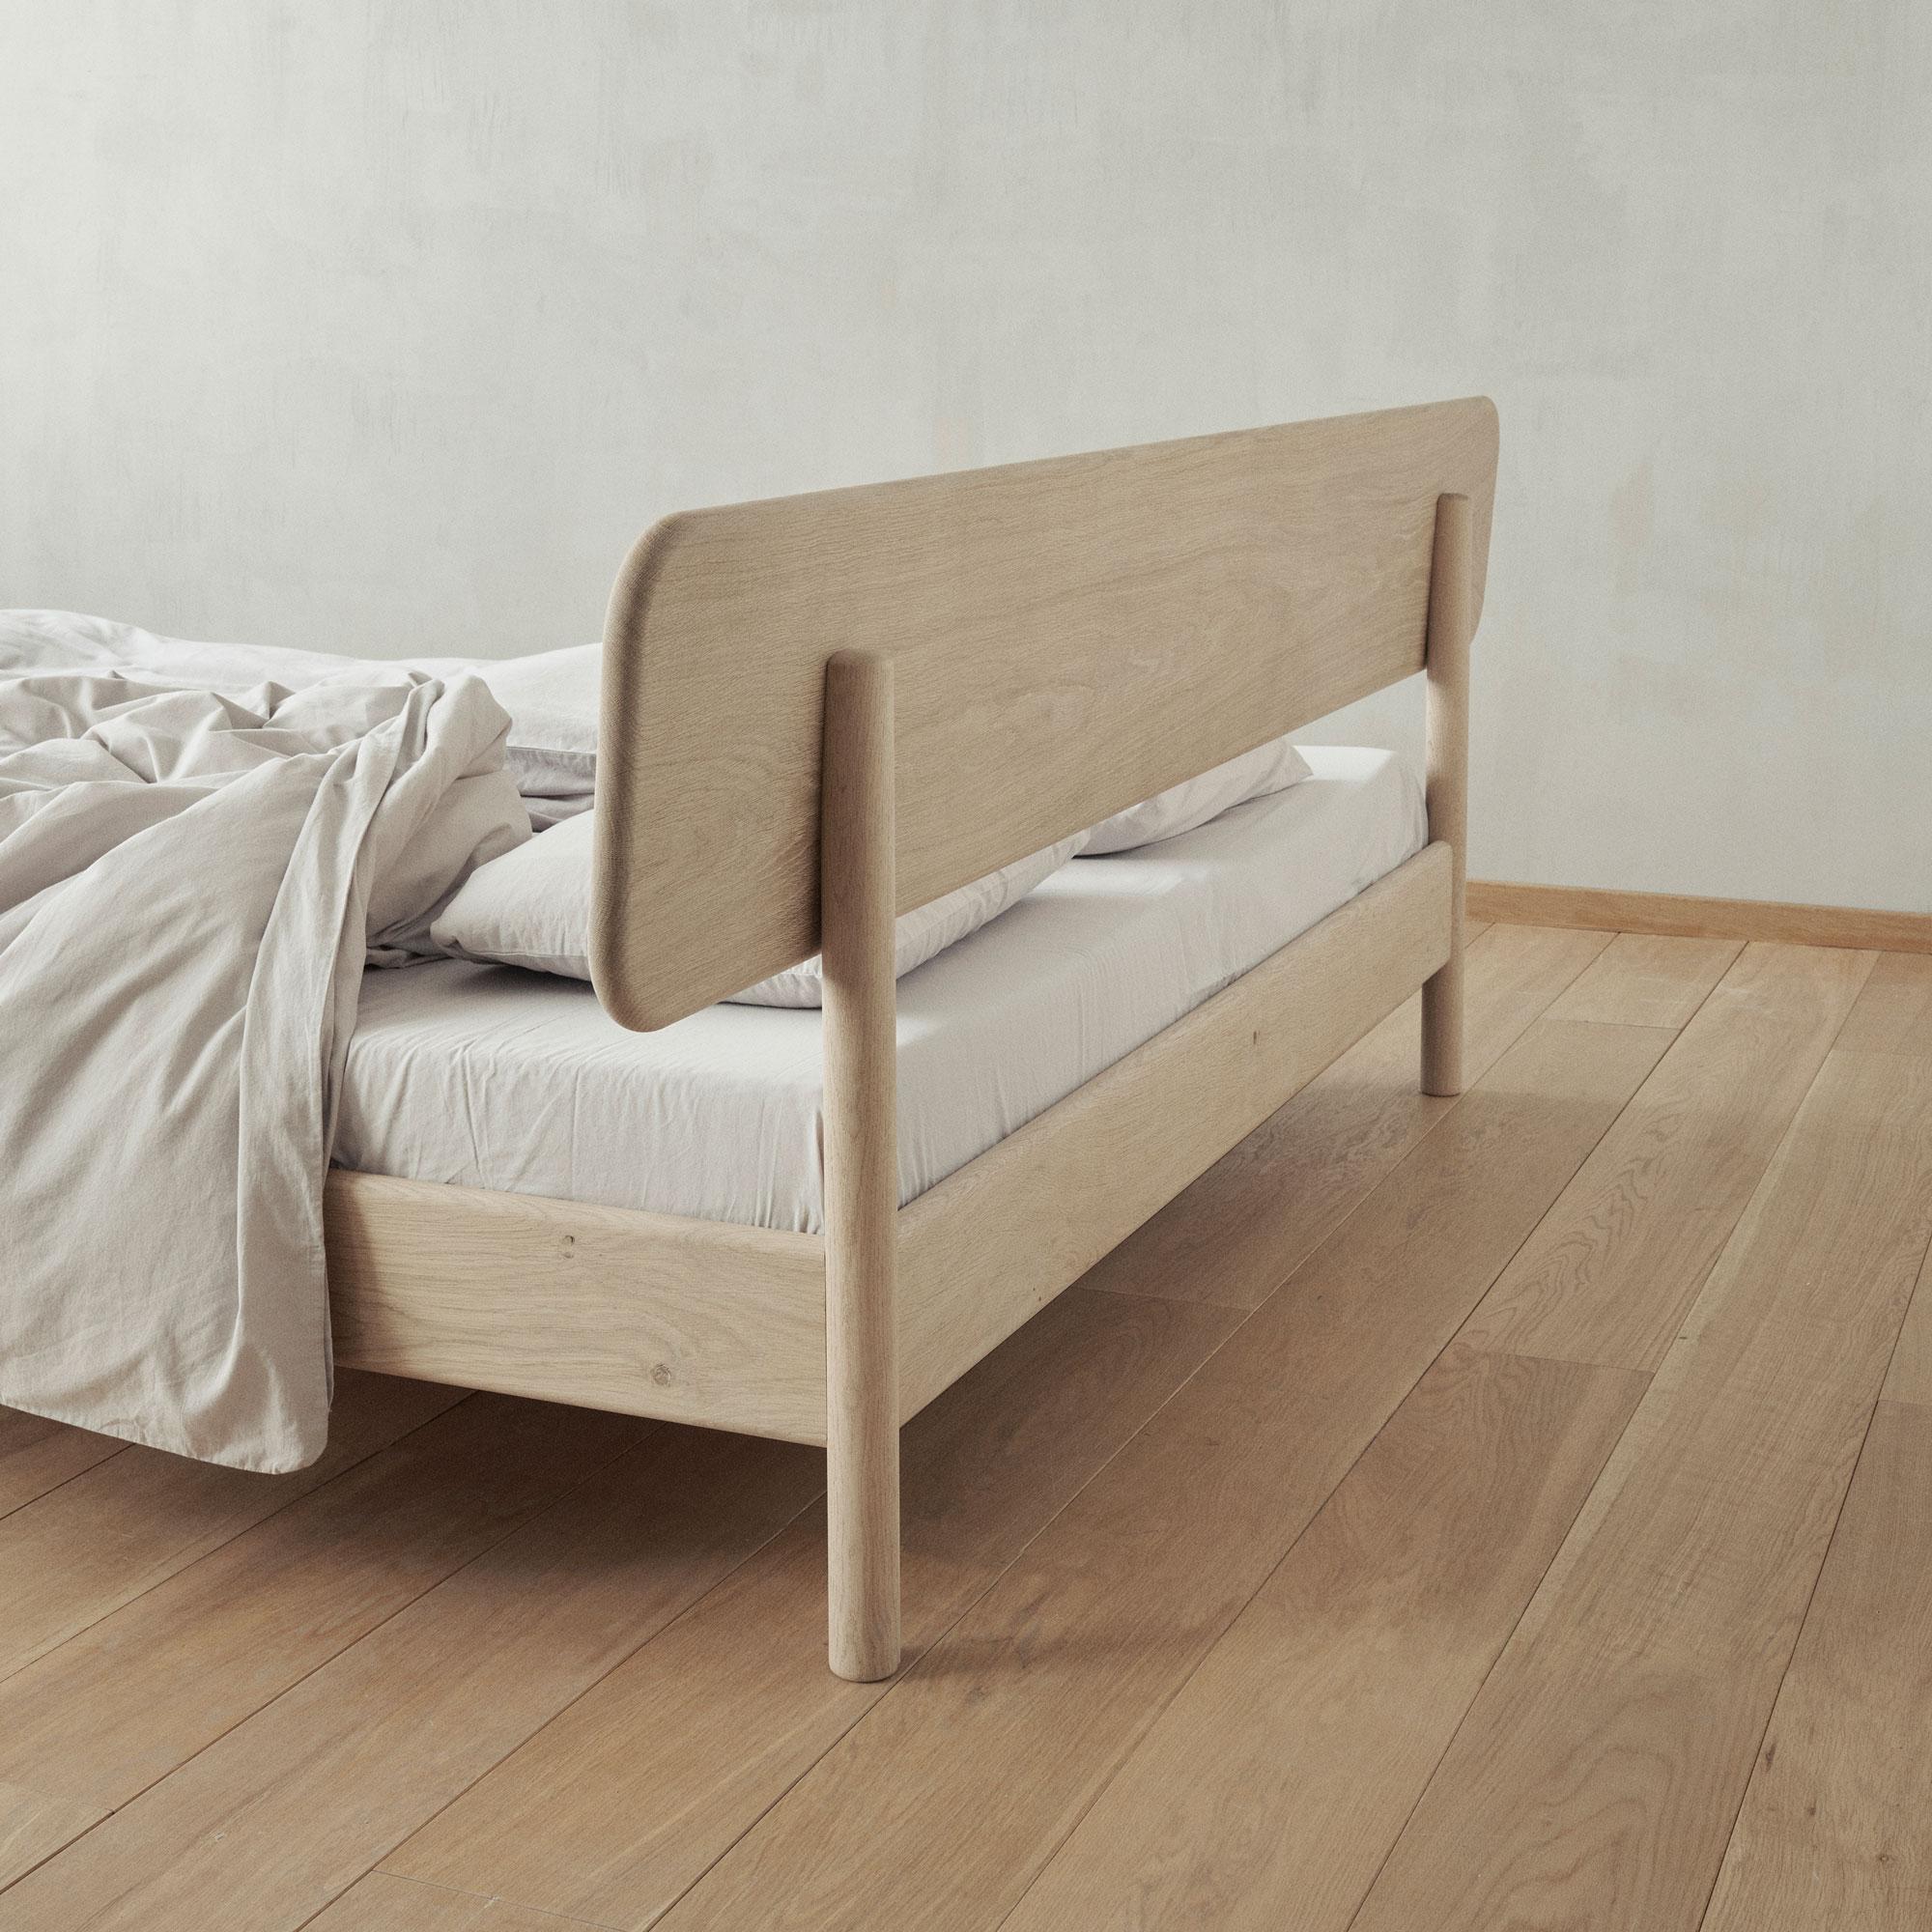 017-ALKEN-BED-AT-THE-LAB-RE-BEDS-DESIGN-BY-OLIVER-&-LUKAS-WEISSKROGH.jpg